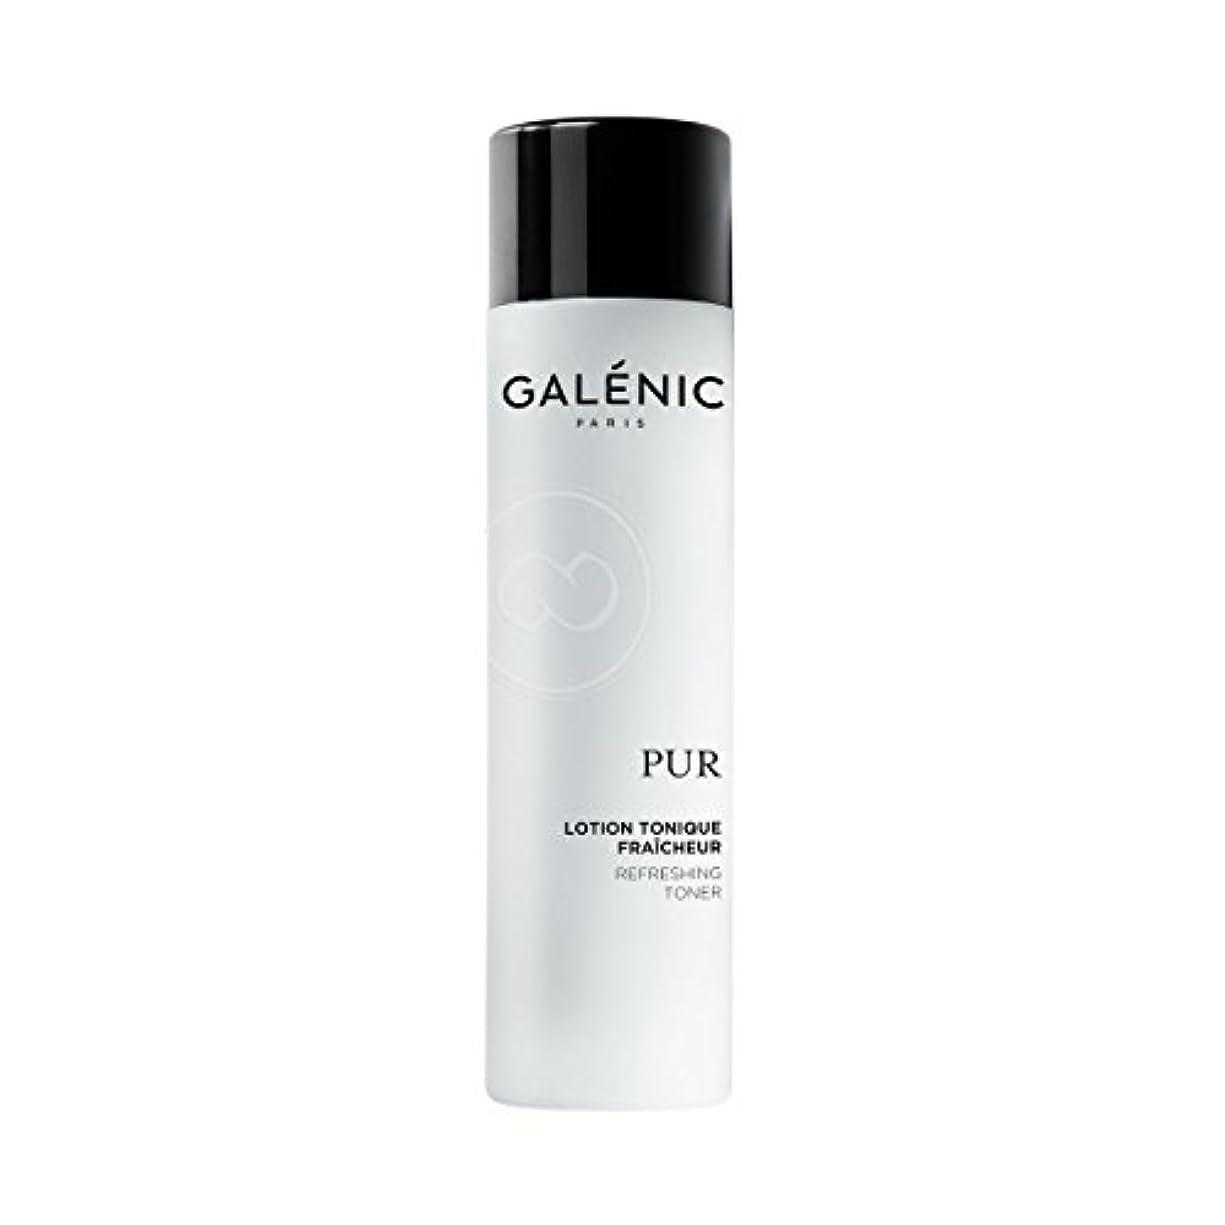 Galenic Pur Refreshing Tonic 200ml [並行輸入品]